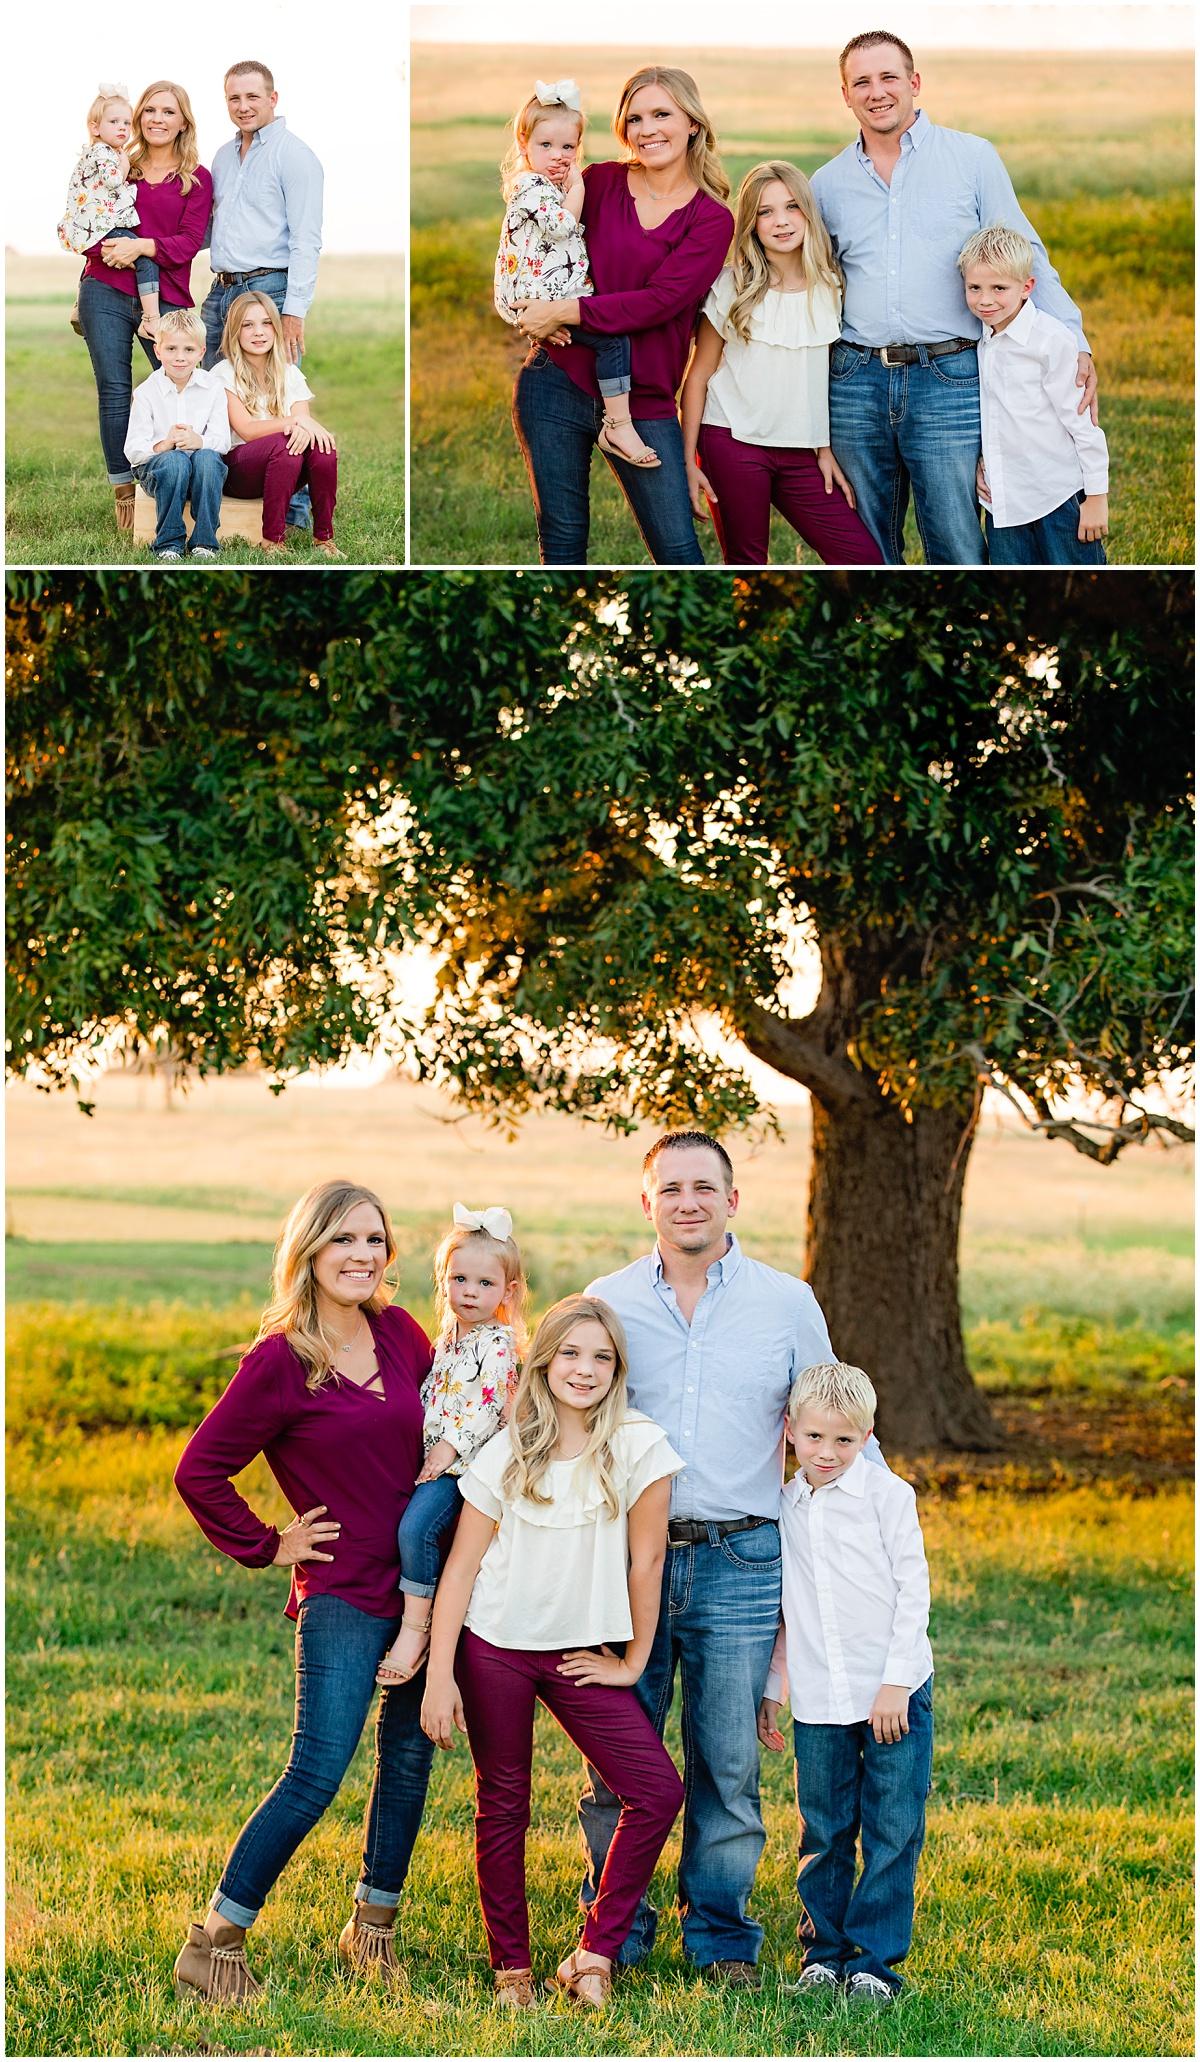 Family-Children-Maternity-Portraits-San-Antonio-Hill-Country-Texas-Carly-Barton-Photography_0024.jpg